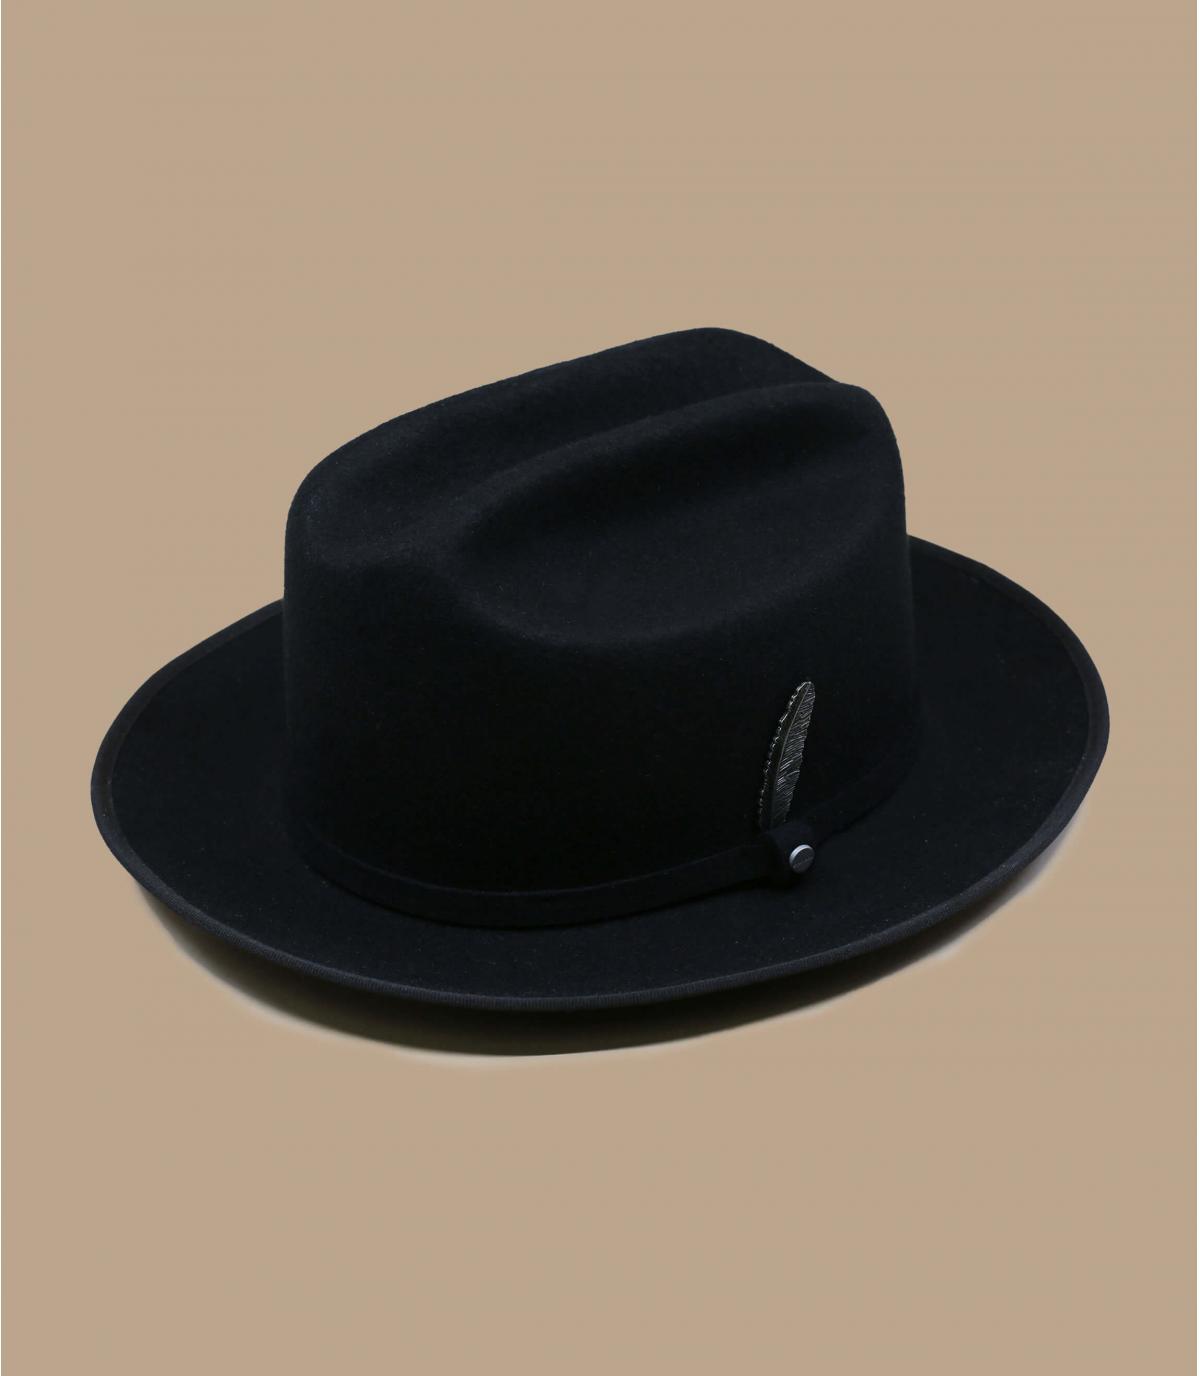 Cowboy Filzhut schwarz Stetson